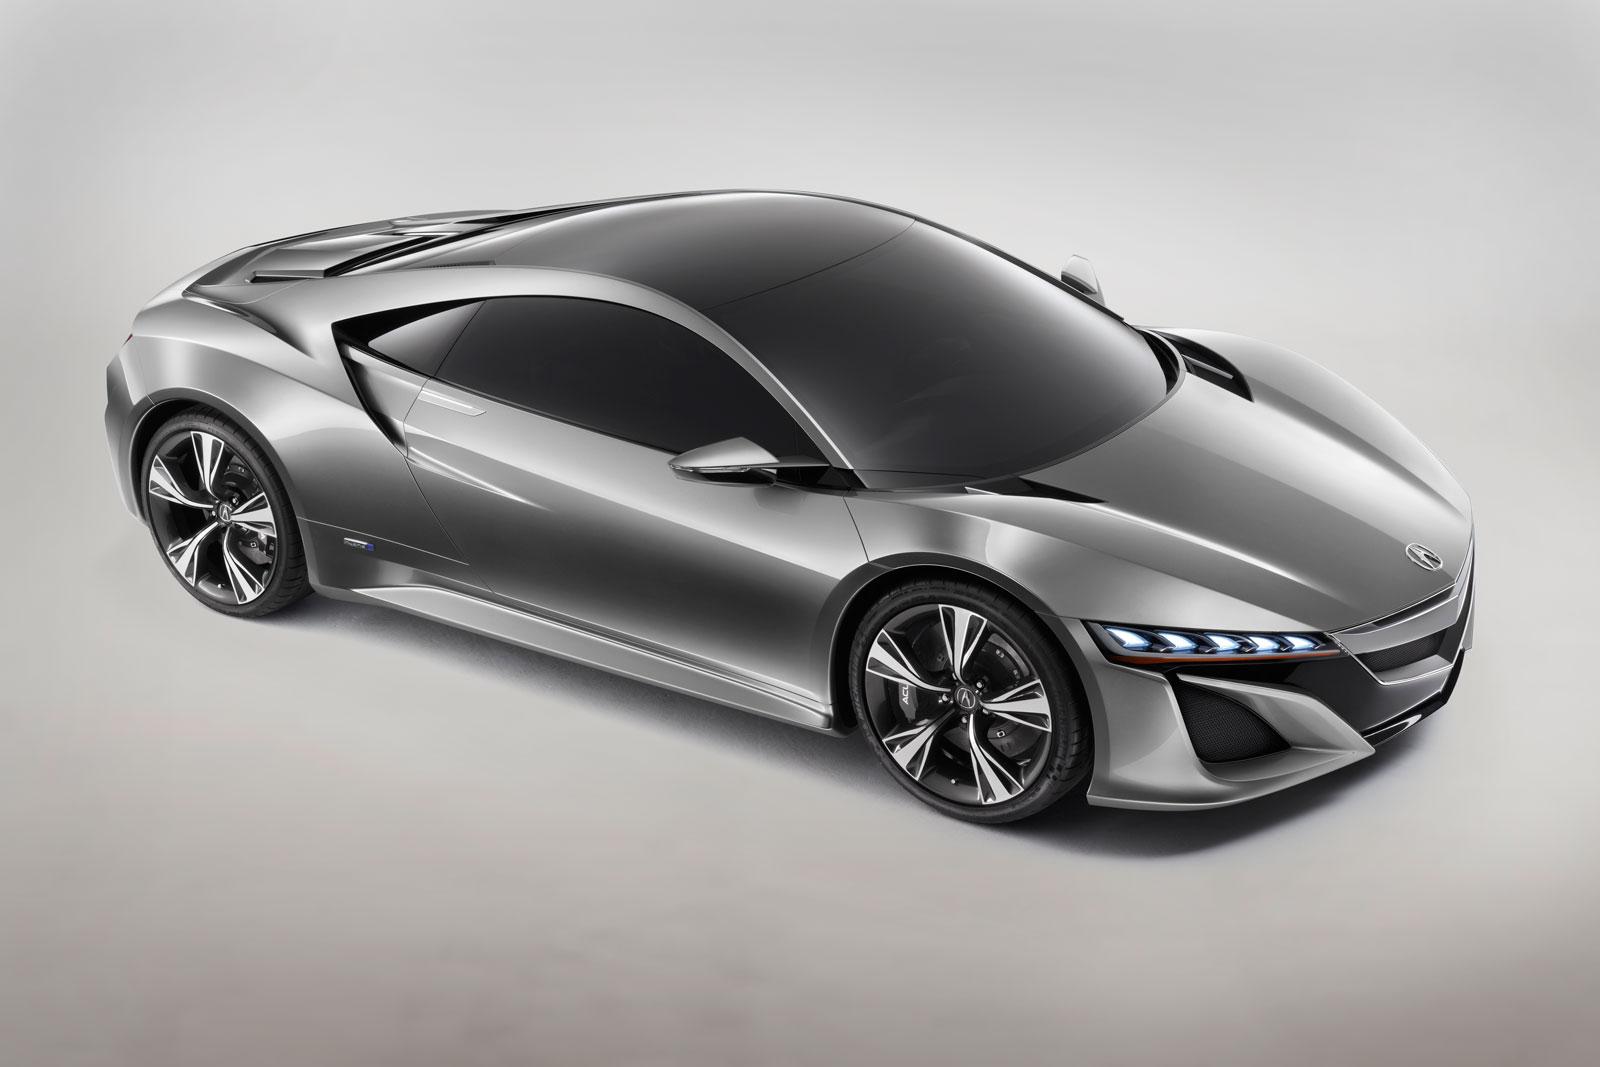 2012_Acura_NSX_Concept_02